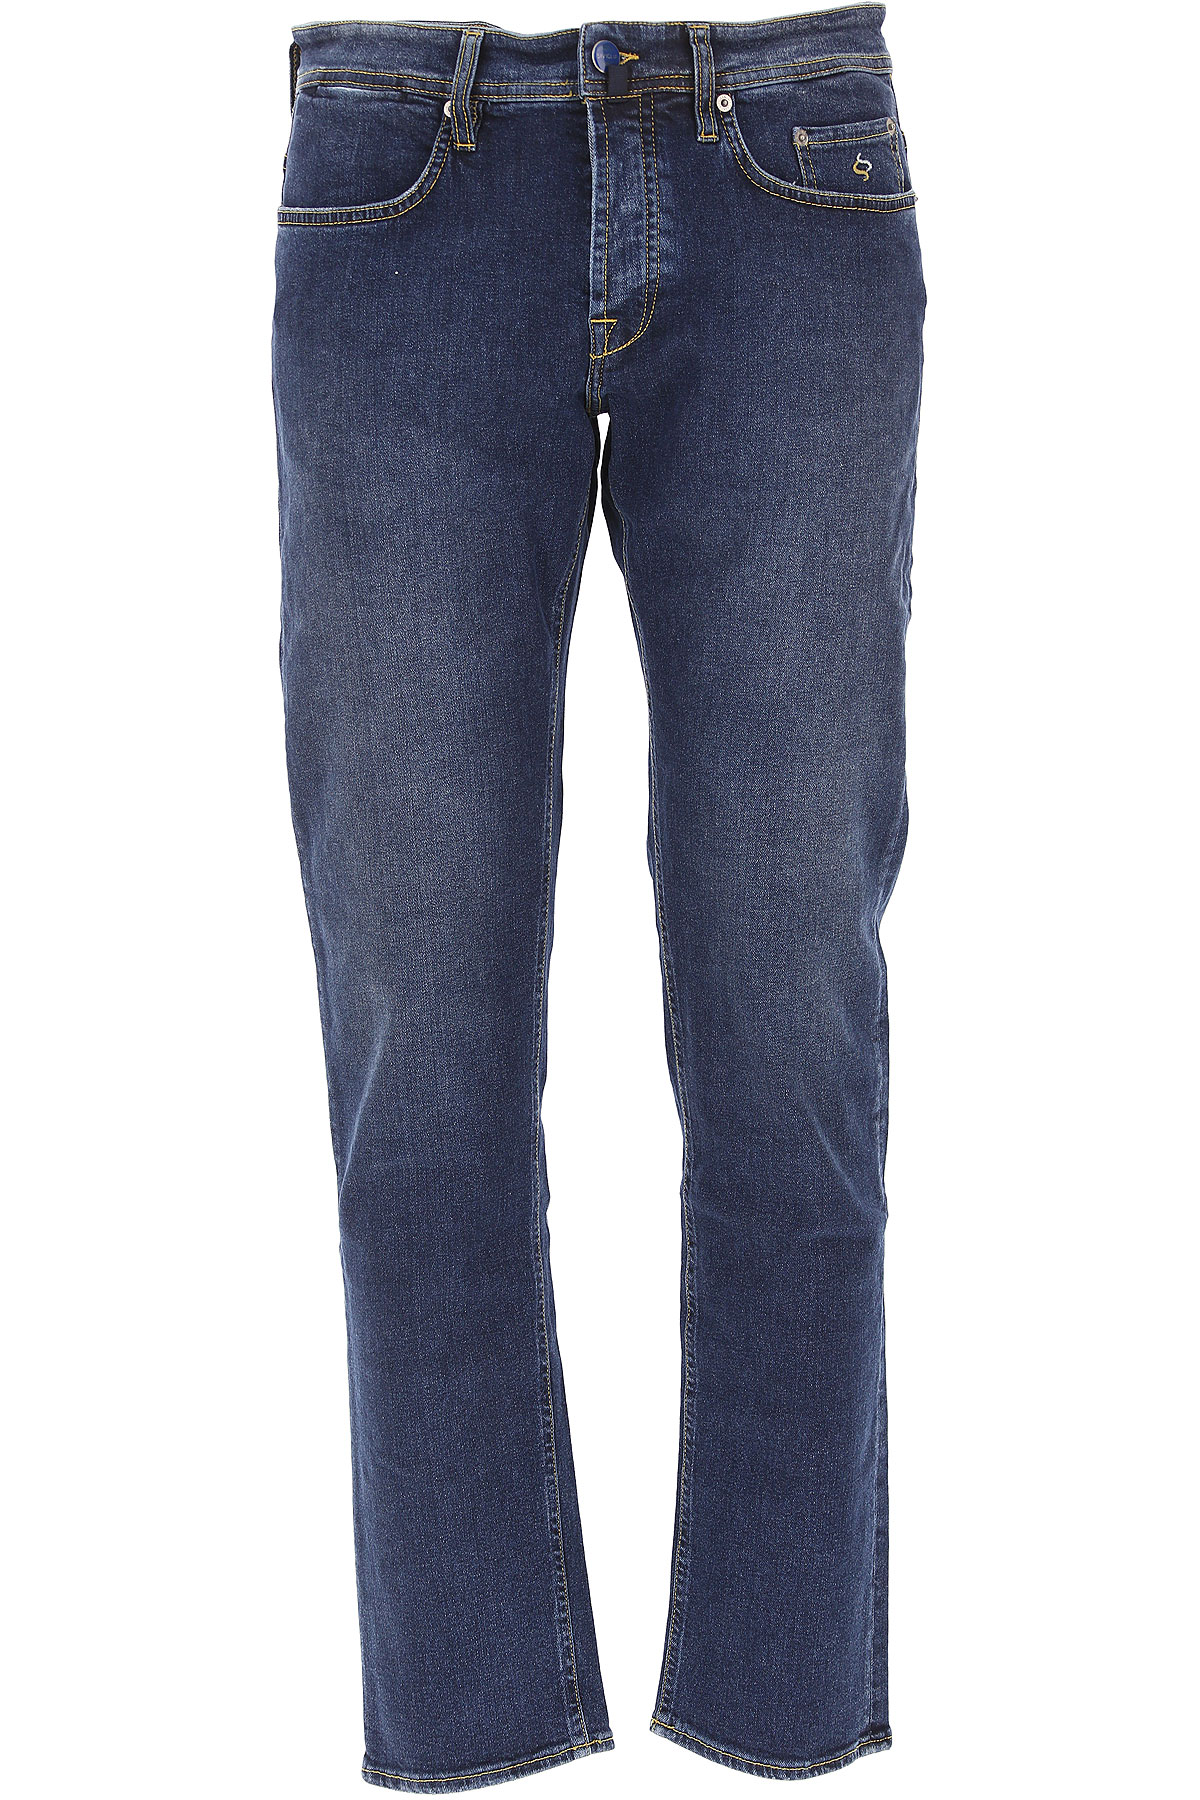 Image of Siviglia Jeans, Dark Denim Blue, Cotton, 2017, 34 40